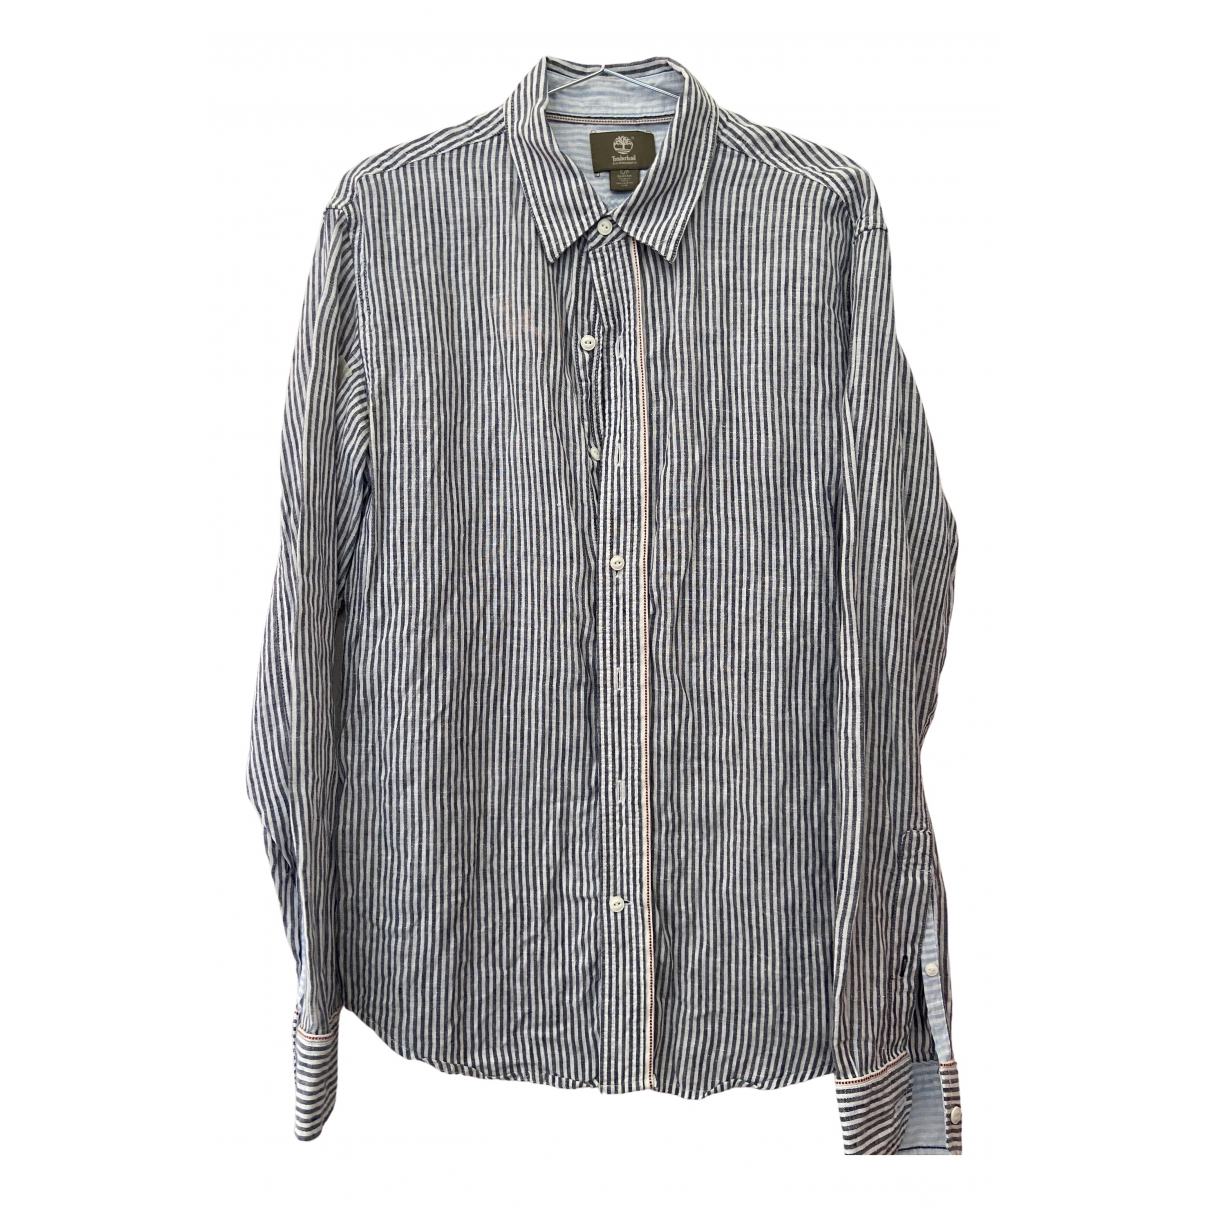 Timberland \N Blue Cotton Shirts for Men S International